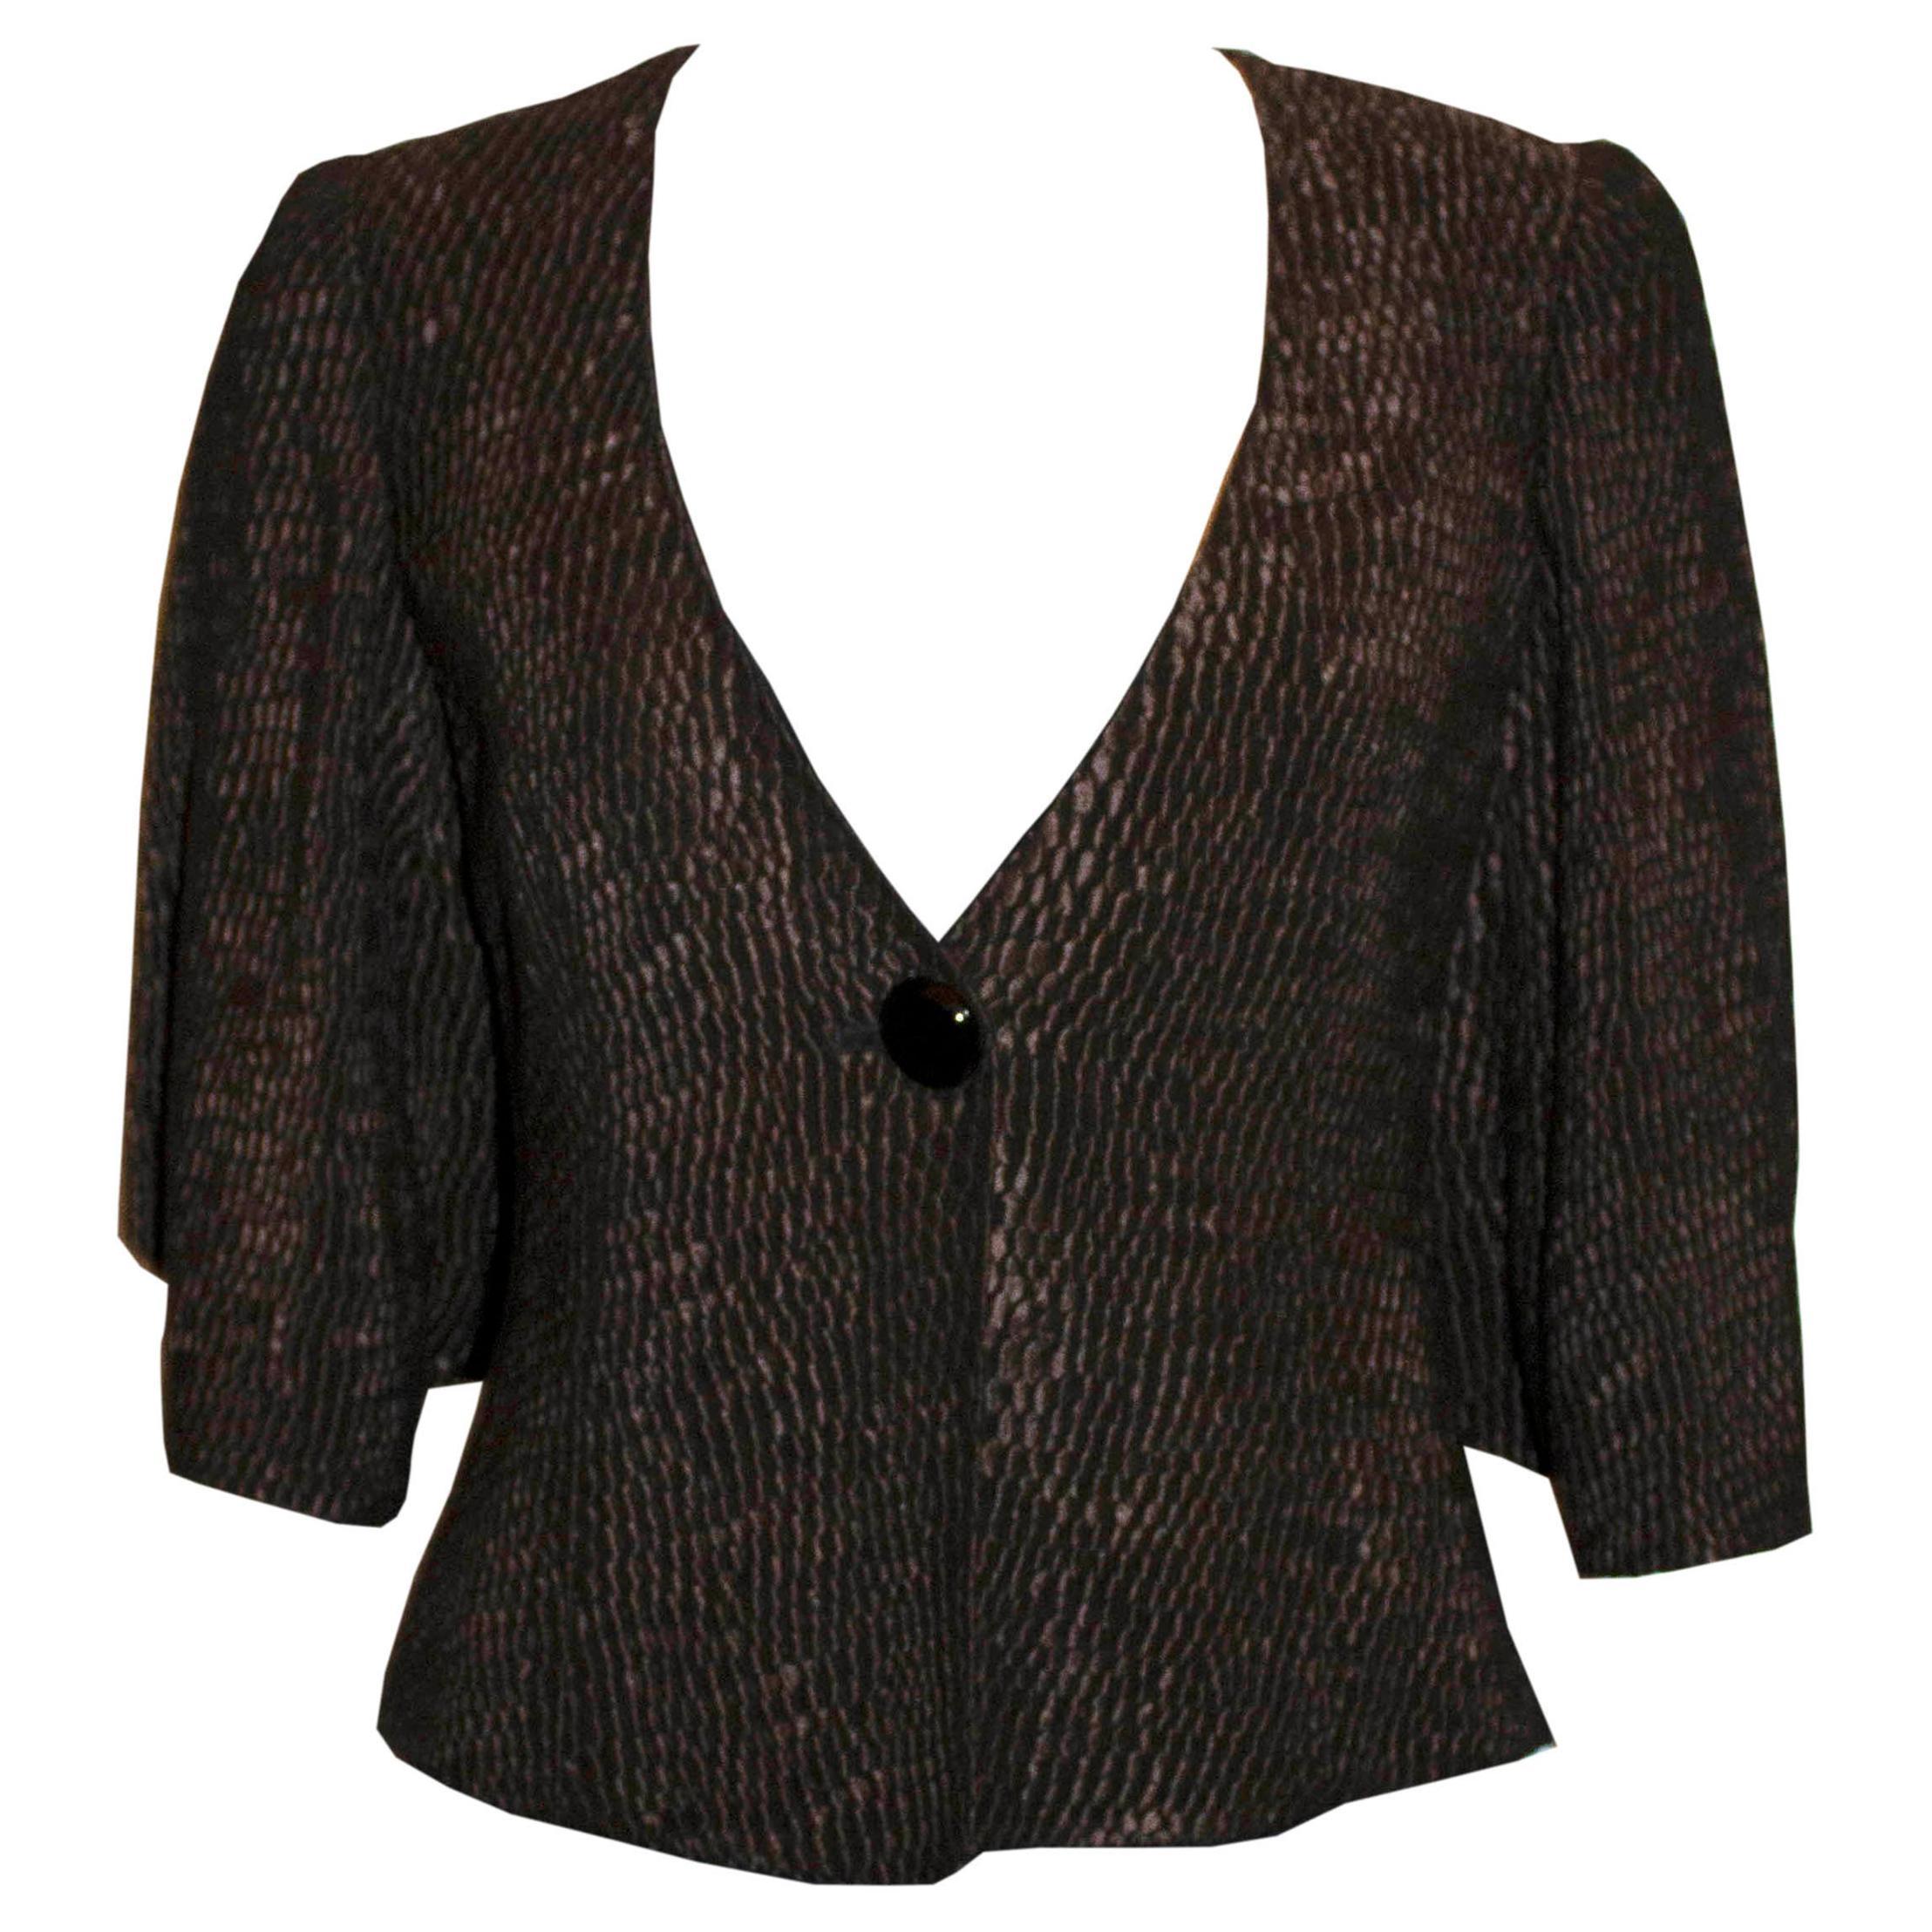 Armani Collezioni Textured Jacket